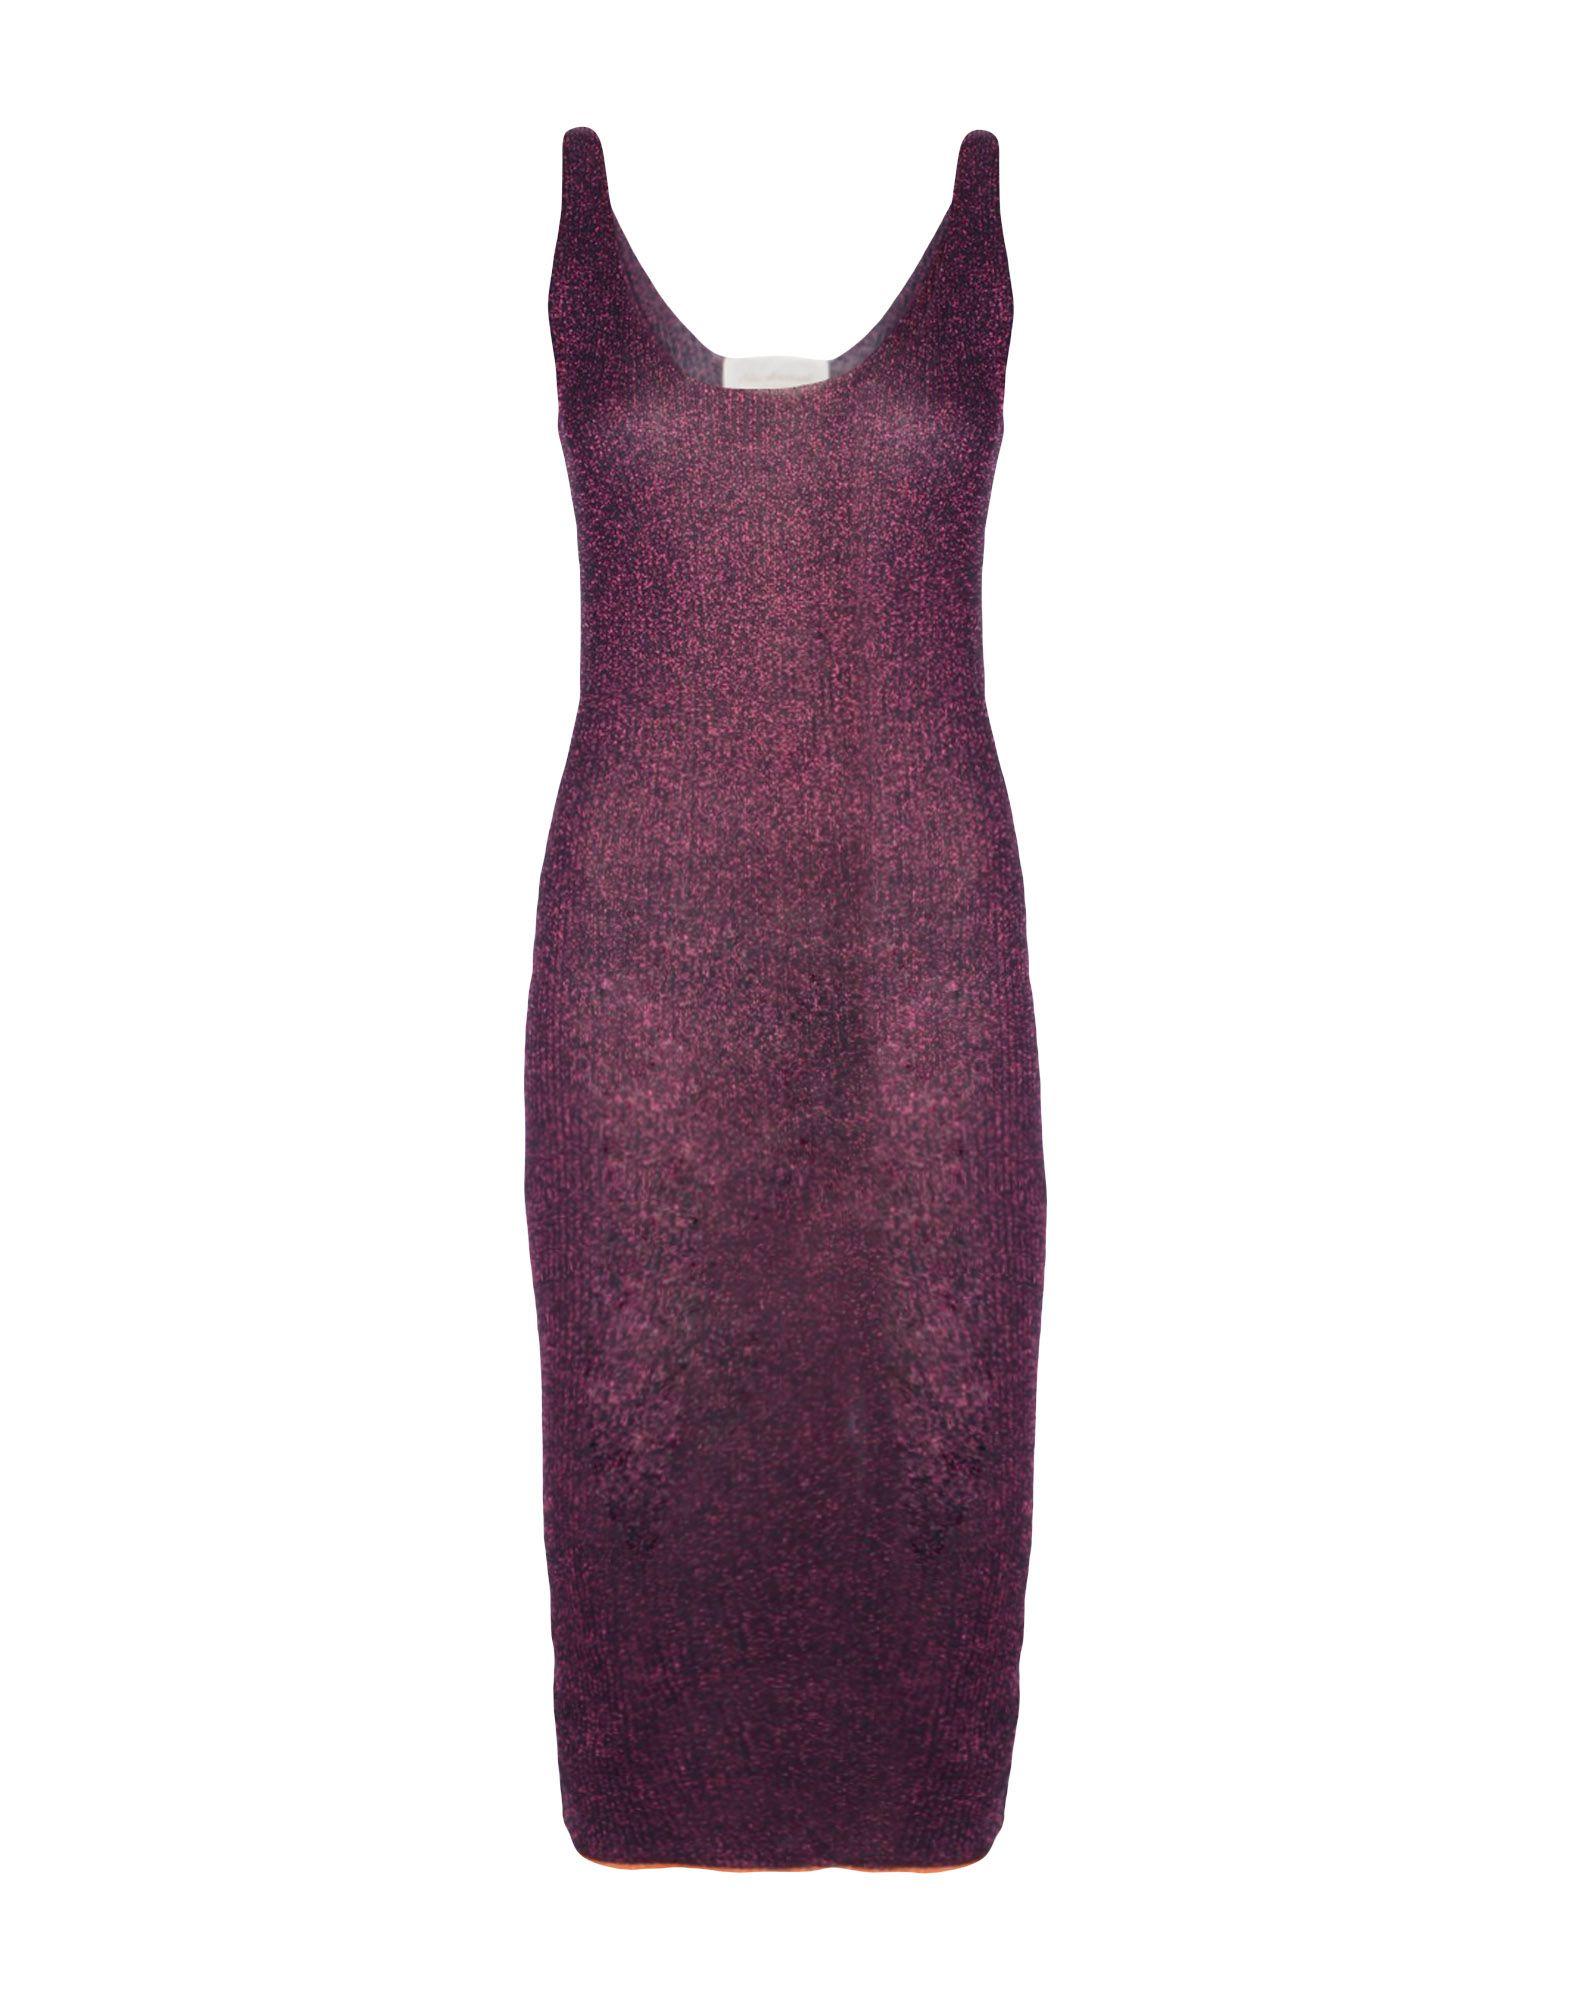 CHIARA BERTANI Платье длиной 3/4 chiara bertani длинное платье